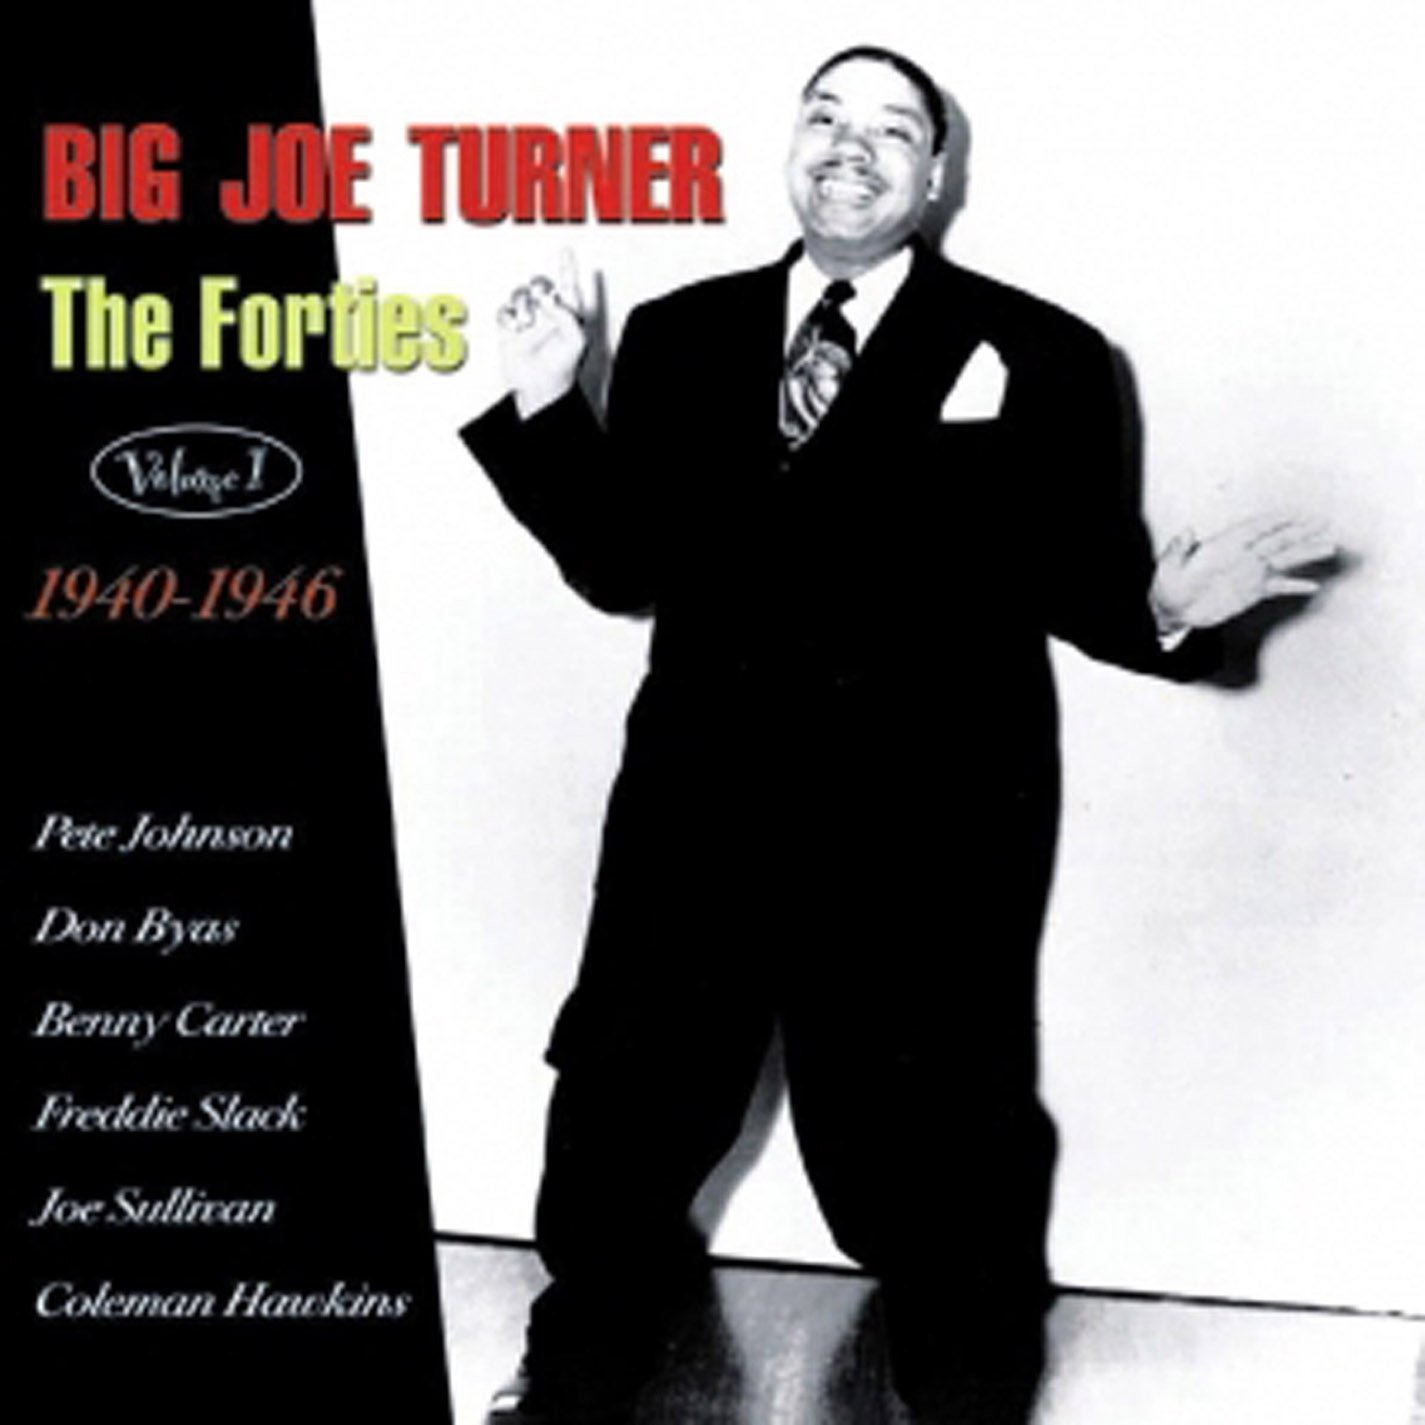 Los Angeles Morgue Files Blues Musician Big Joe Turner